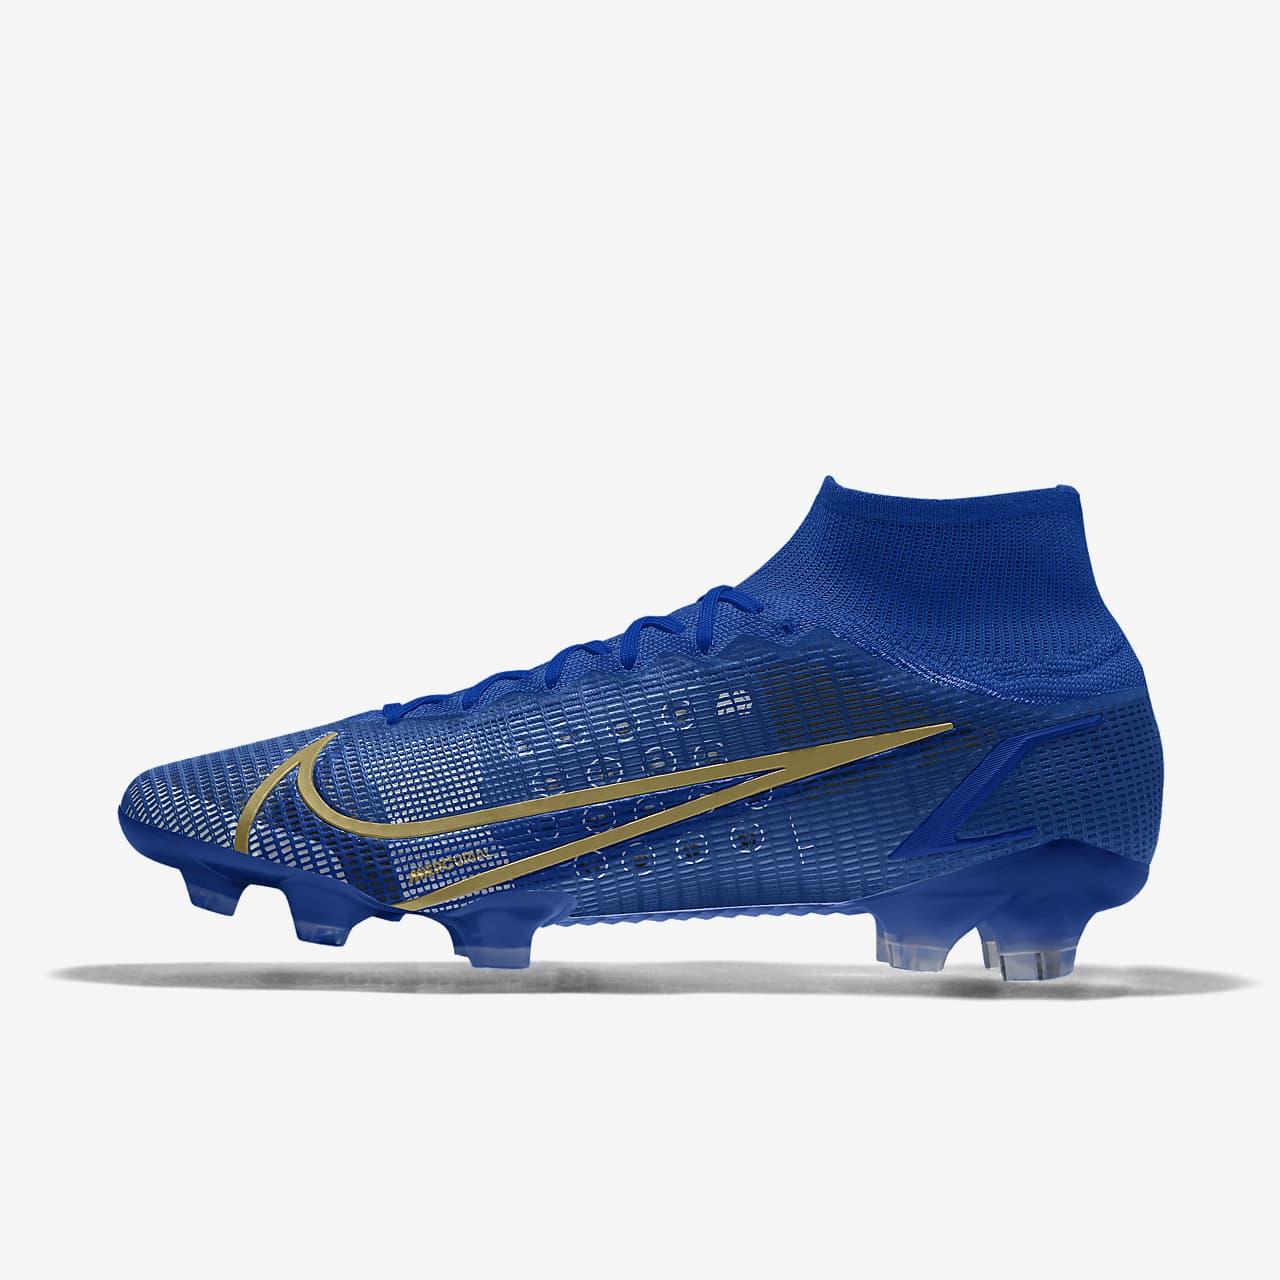 Nike Mercurial Superfly 8 Elite By You Custom Football Boot